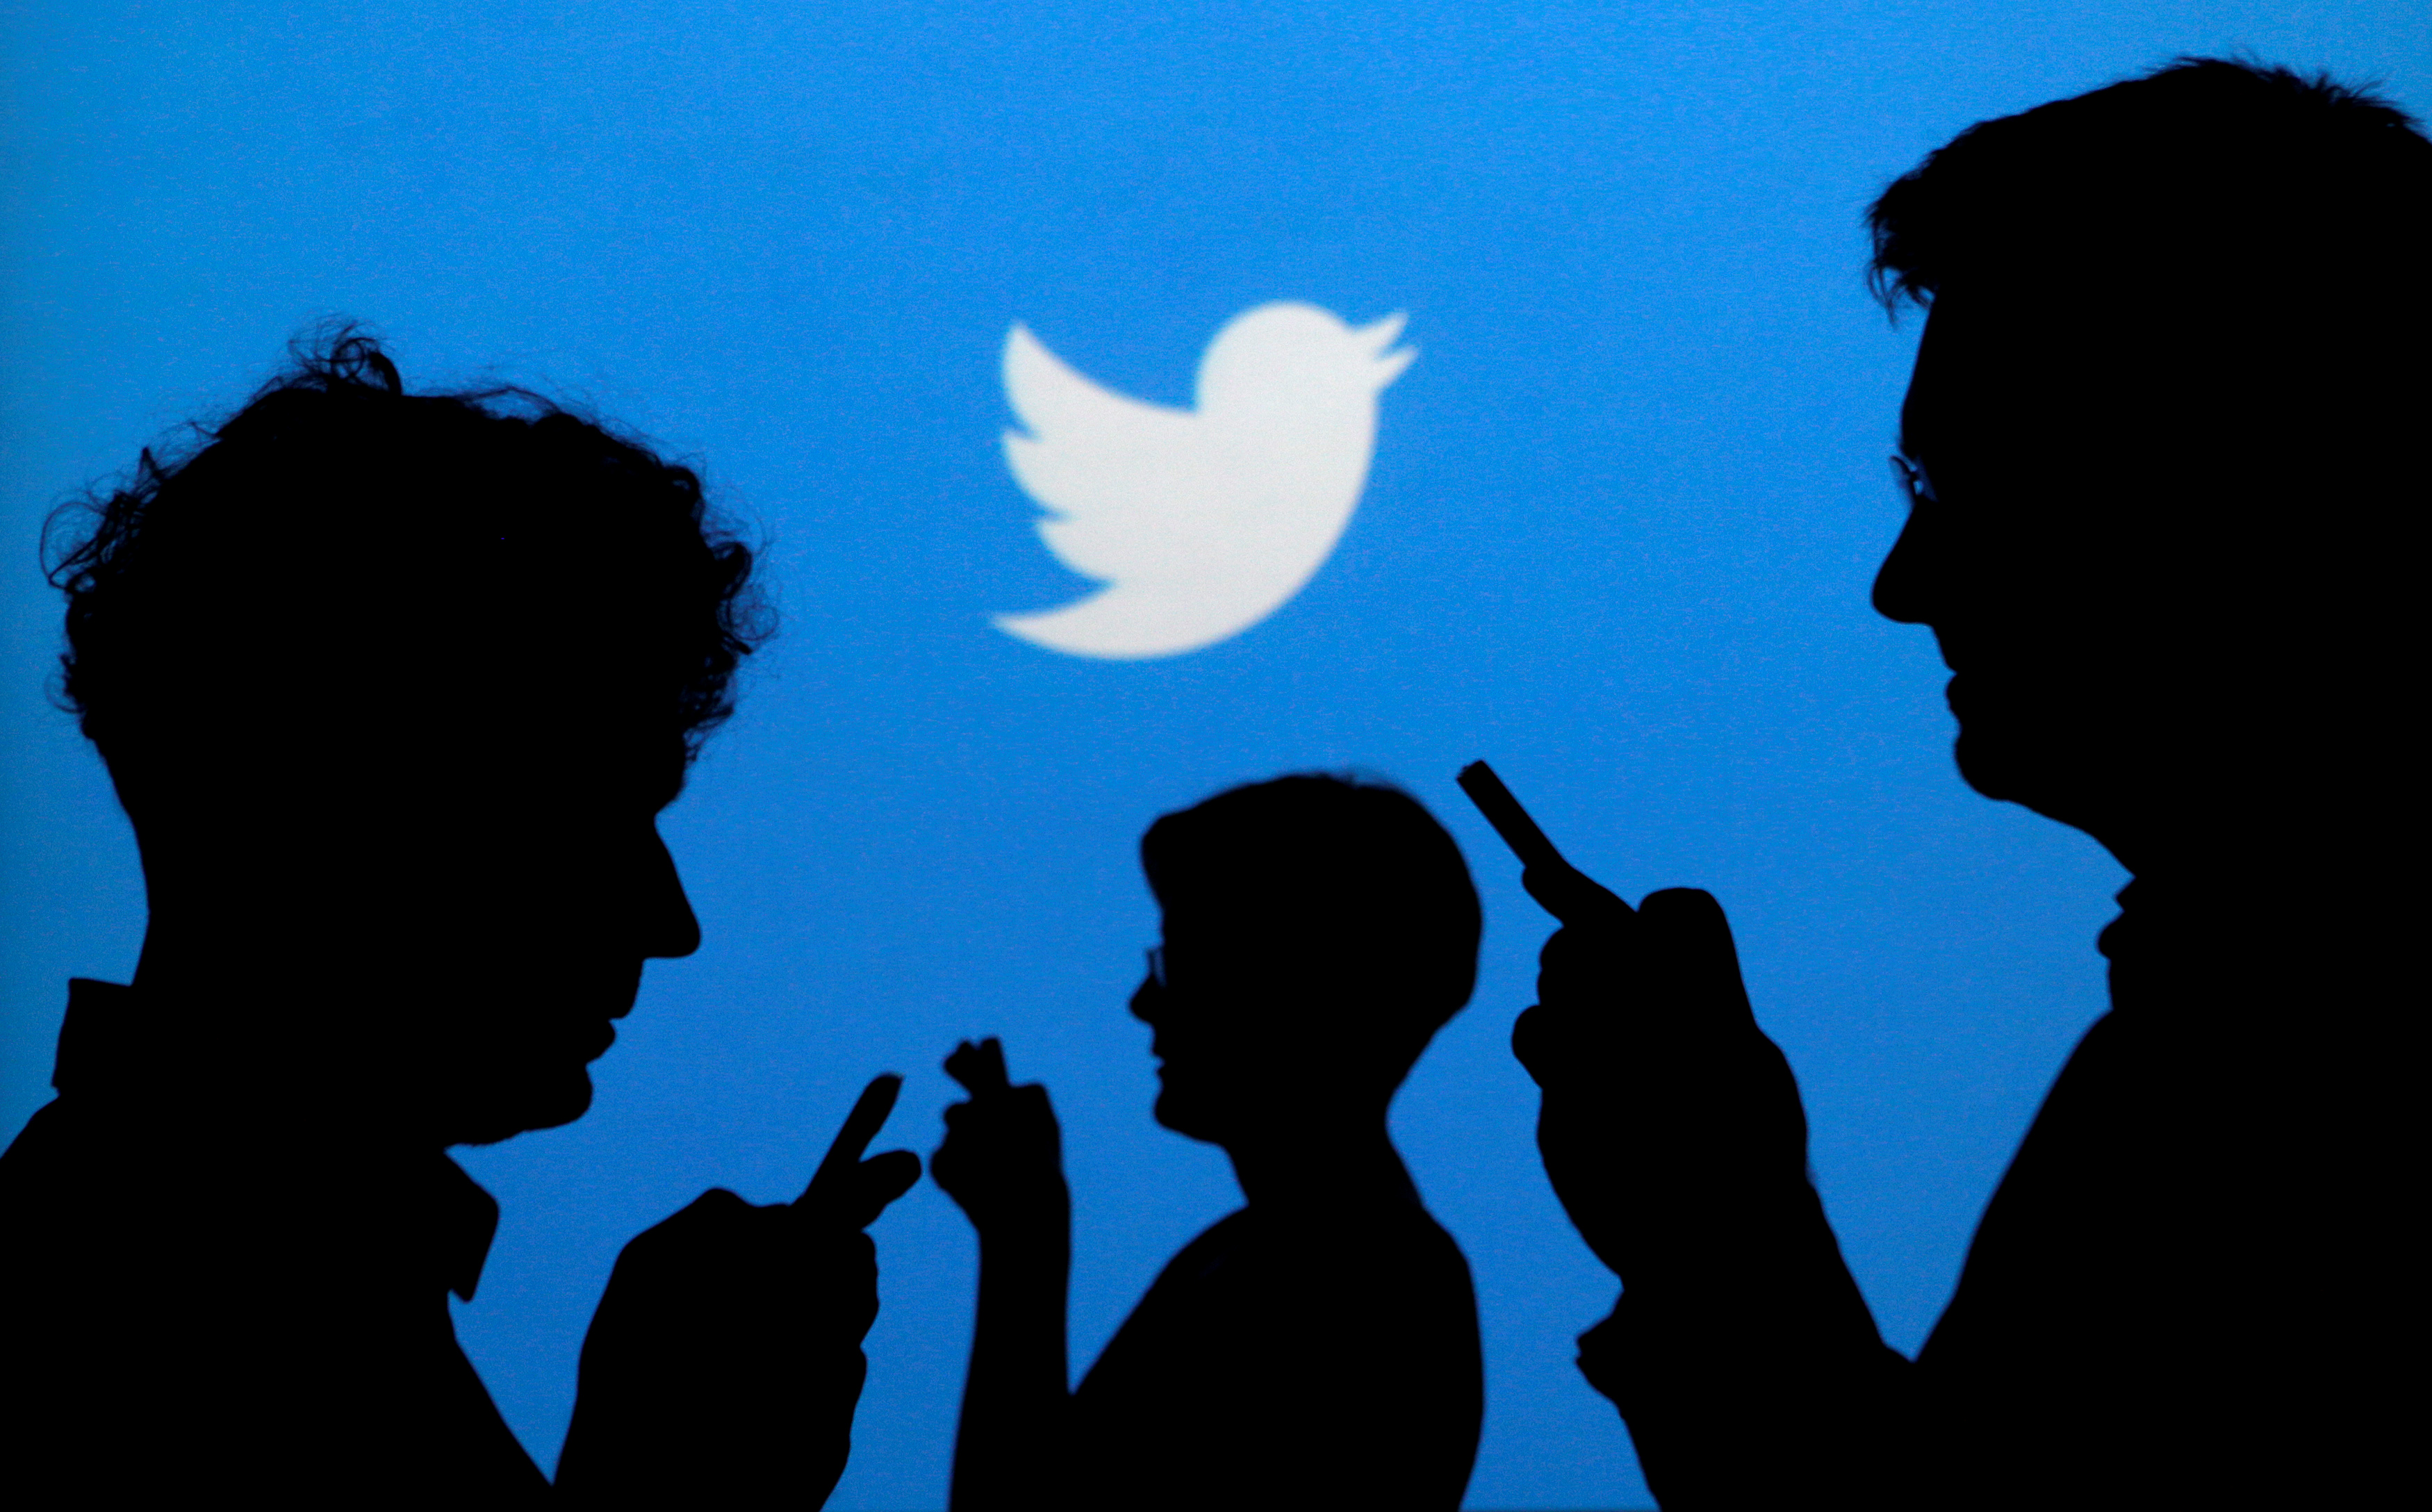 twitter-logo-silhouettes-internautes-usagers-reseau-sociaux